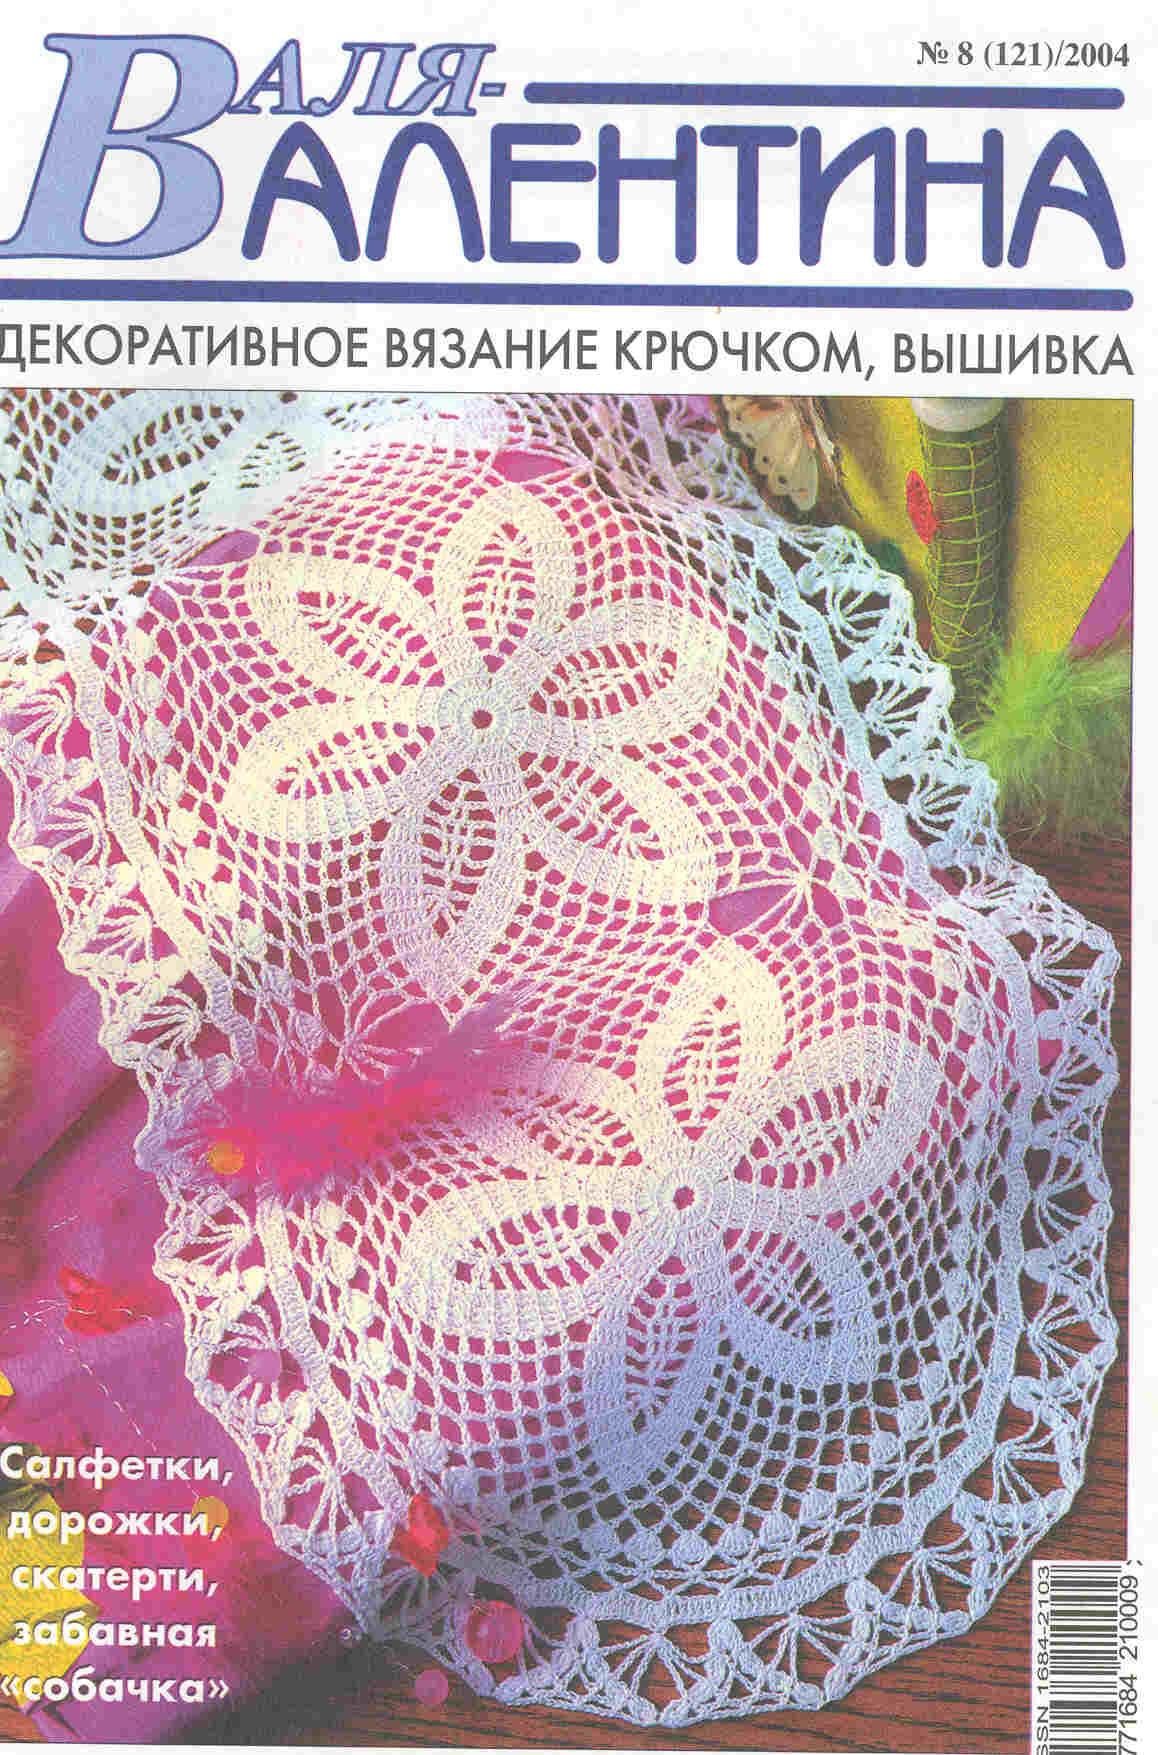 Вязание салфеток из журнала валя валентина 952